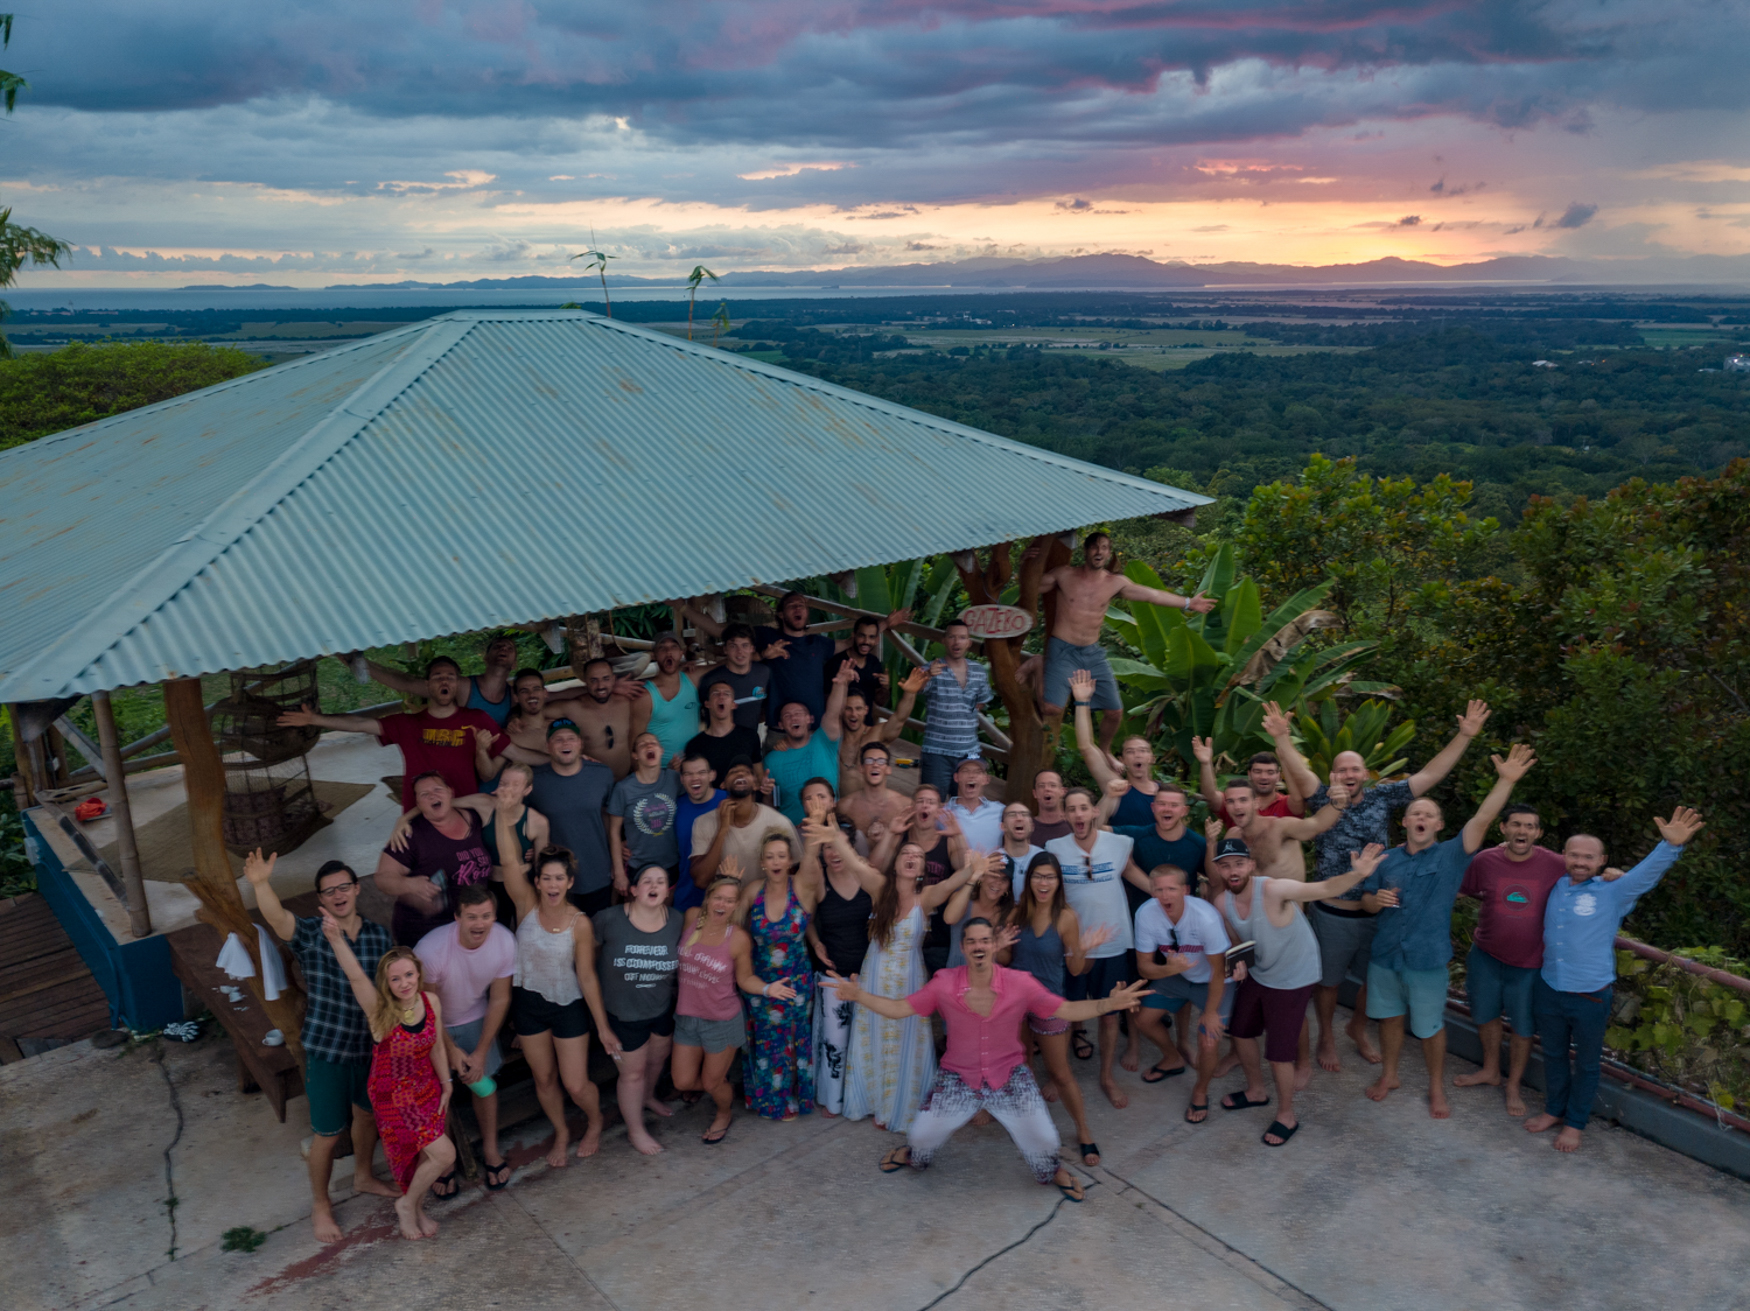 Yoga-Retreat-Photography-Costa-Rica-25.jpg